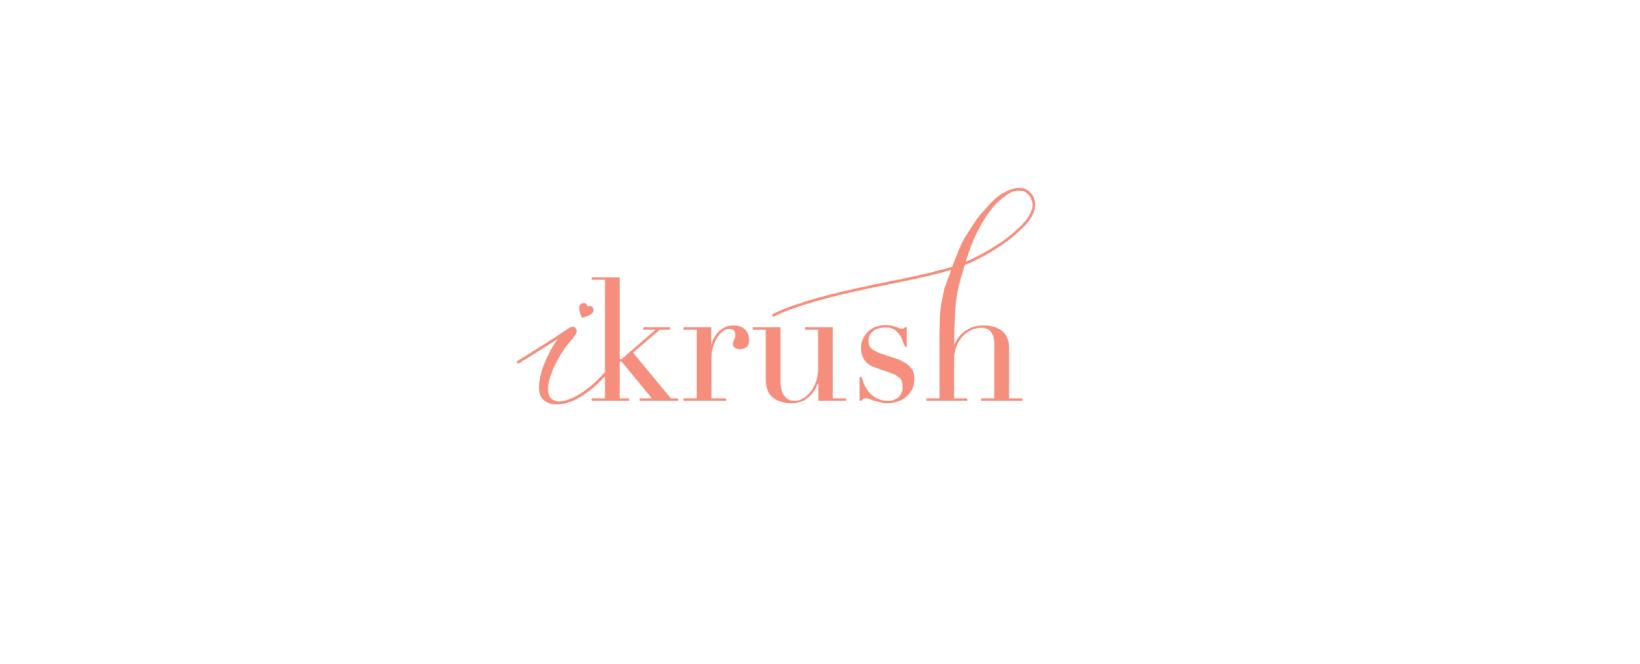 IKrush Coupon Code 2021